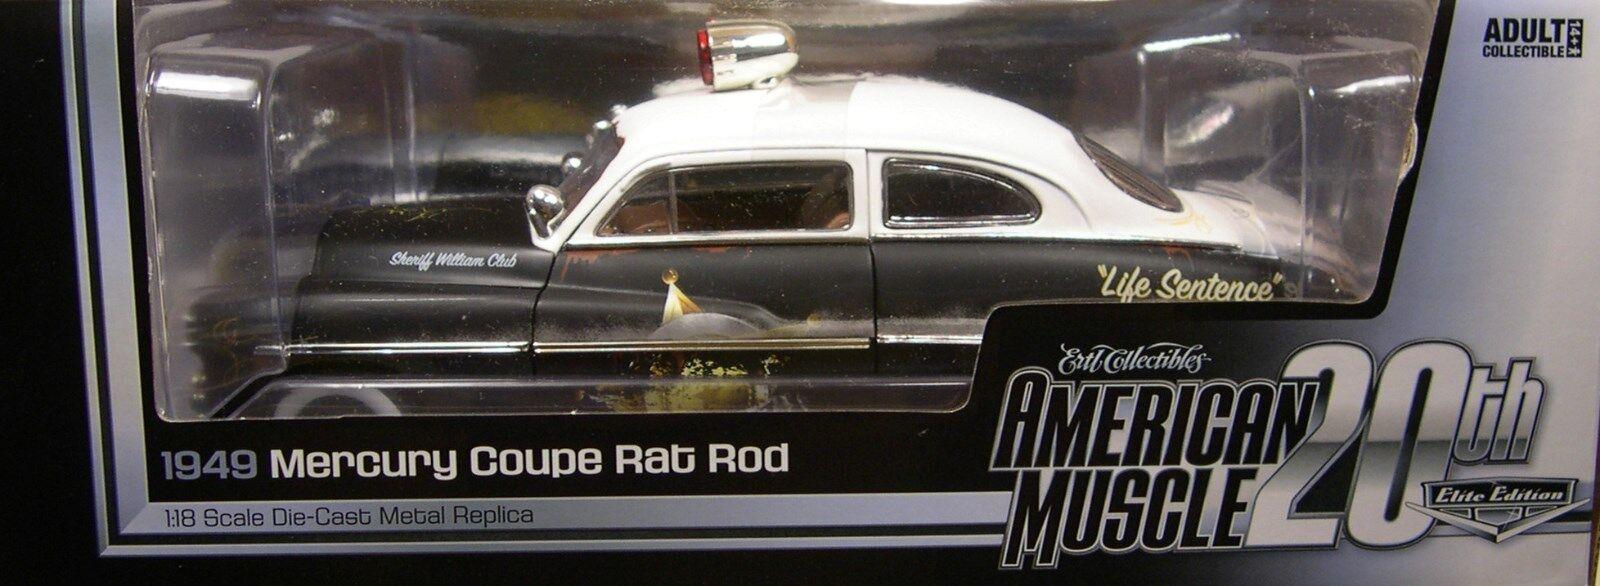 1949 MERCURY RAT ROD POLICE CAR AUTO WORLD 1 18 SCALE DIECAST METAL MODEL CAR